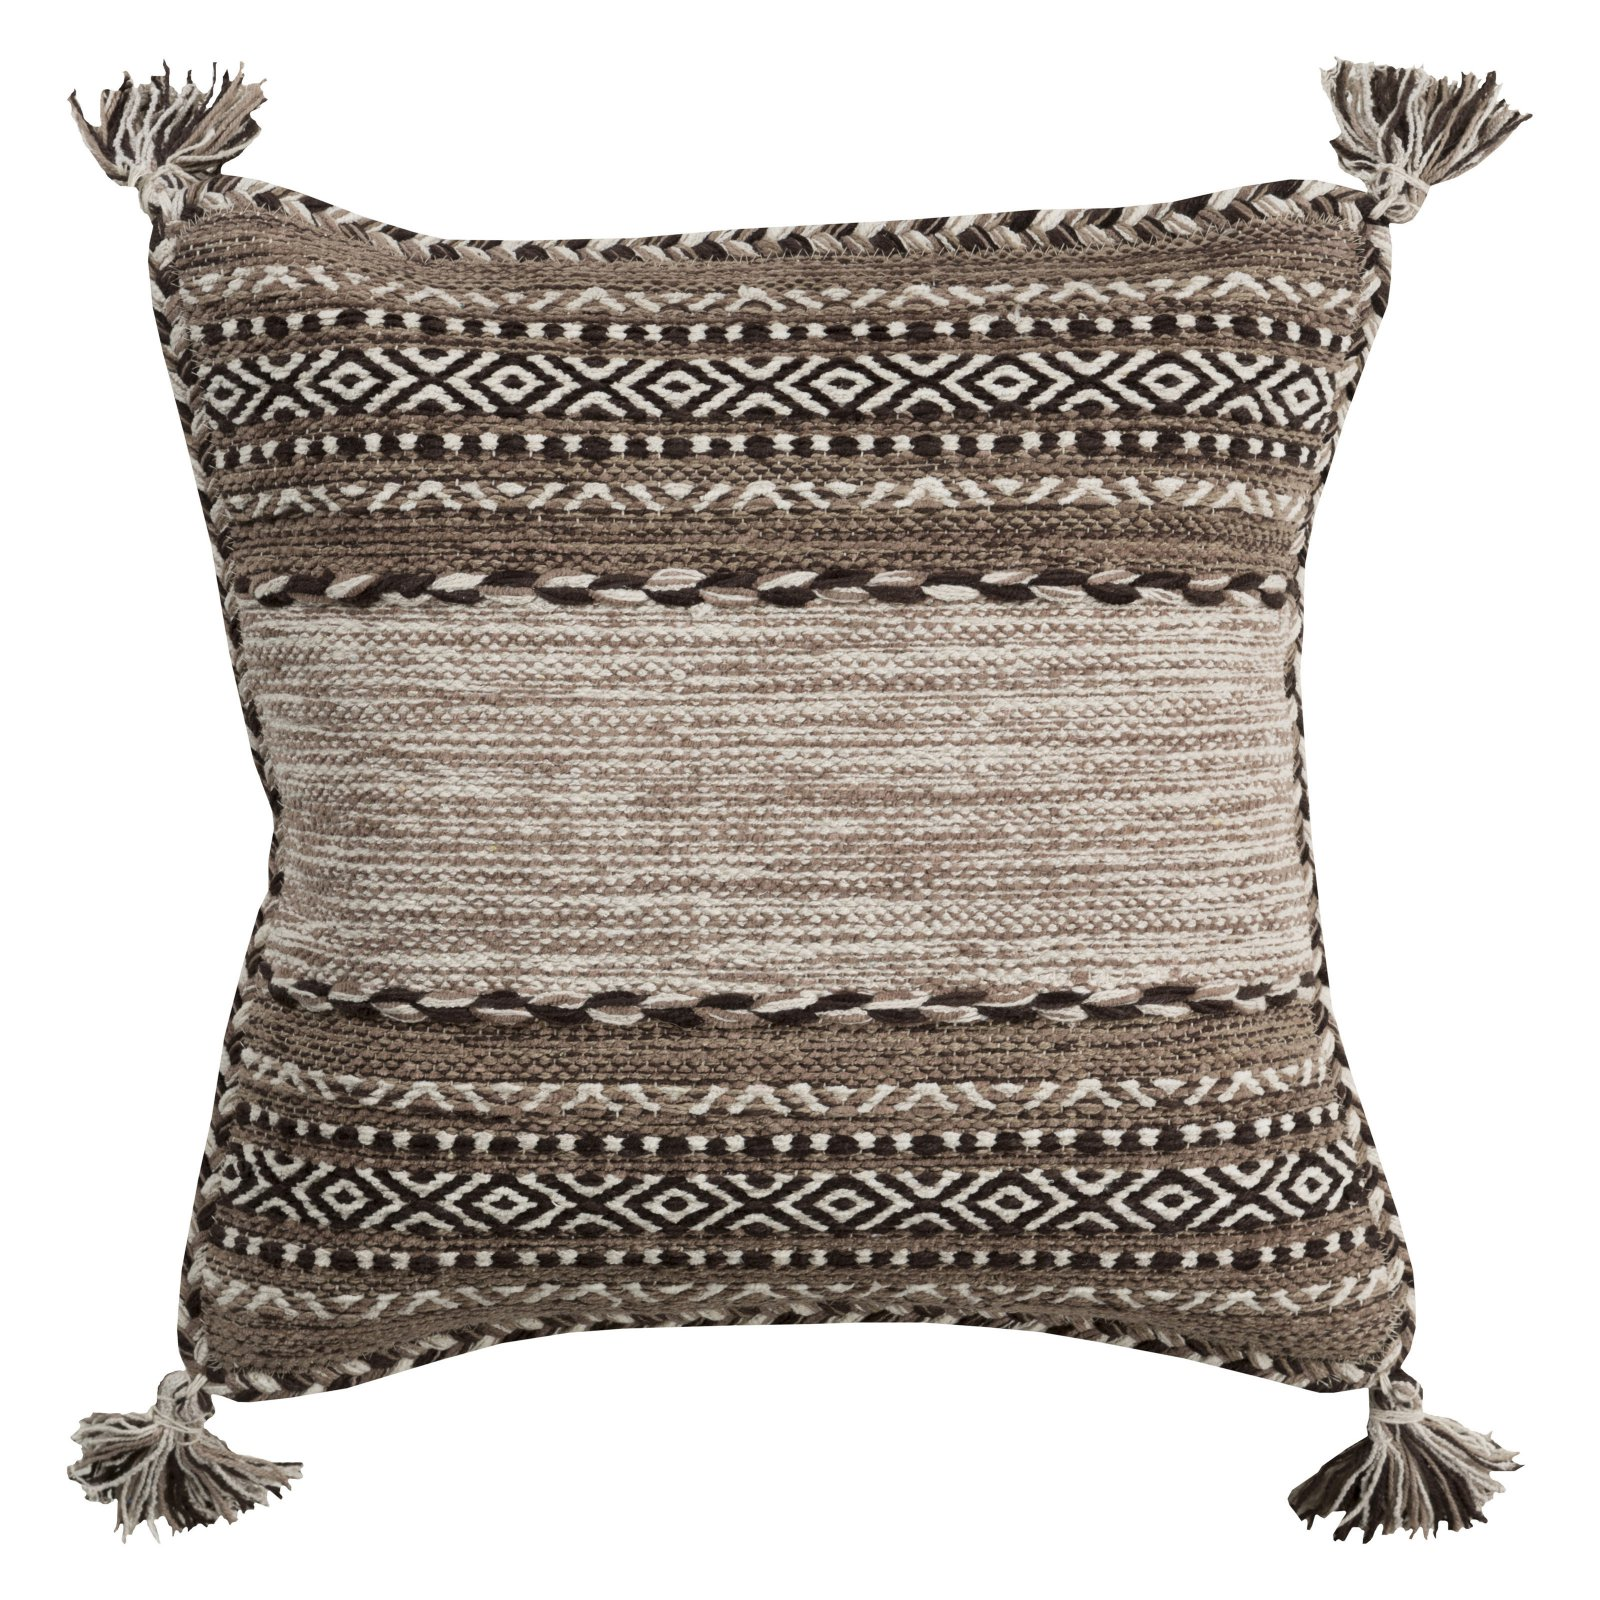 Surya Trenza Decorative Throw Pillow